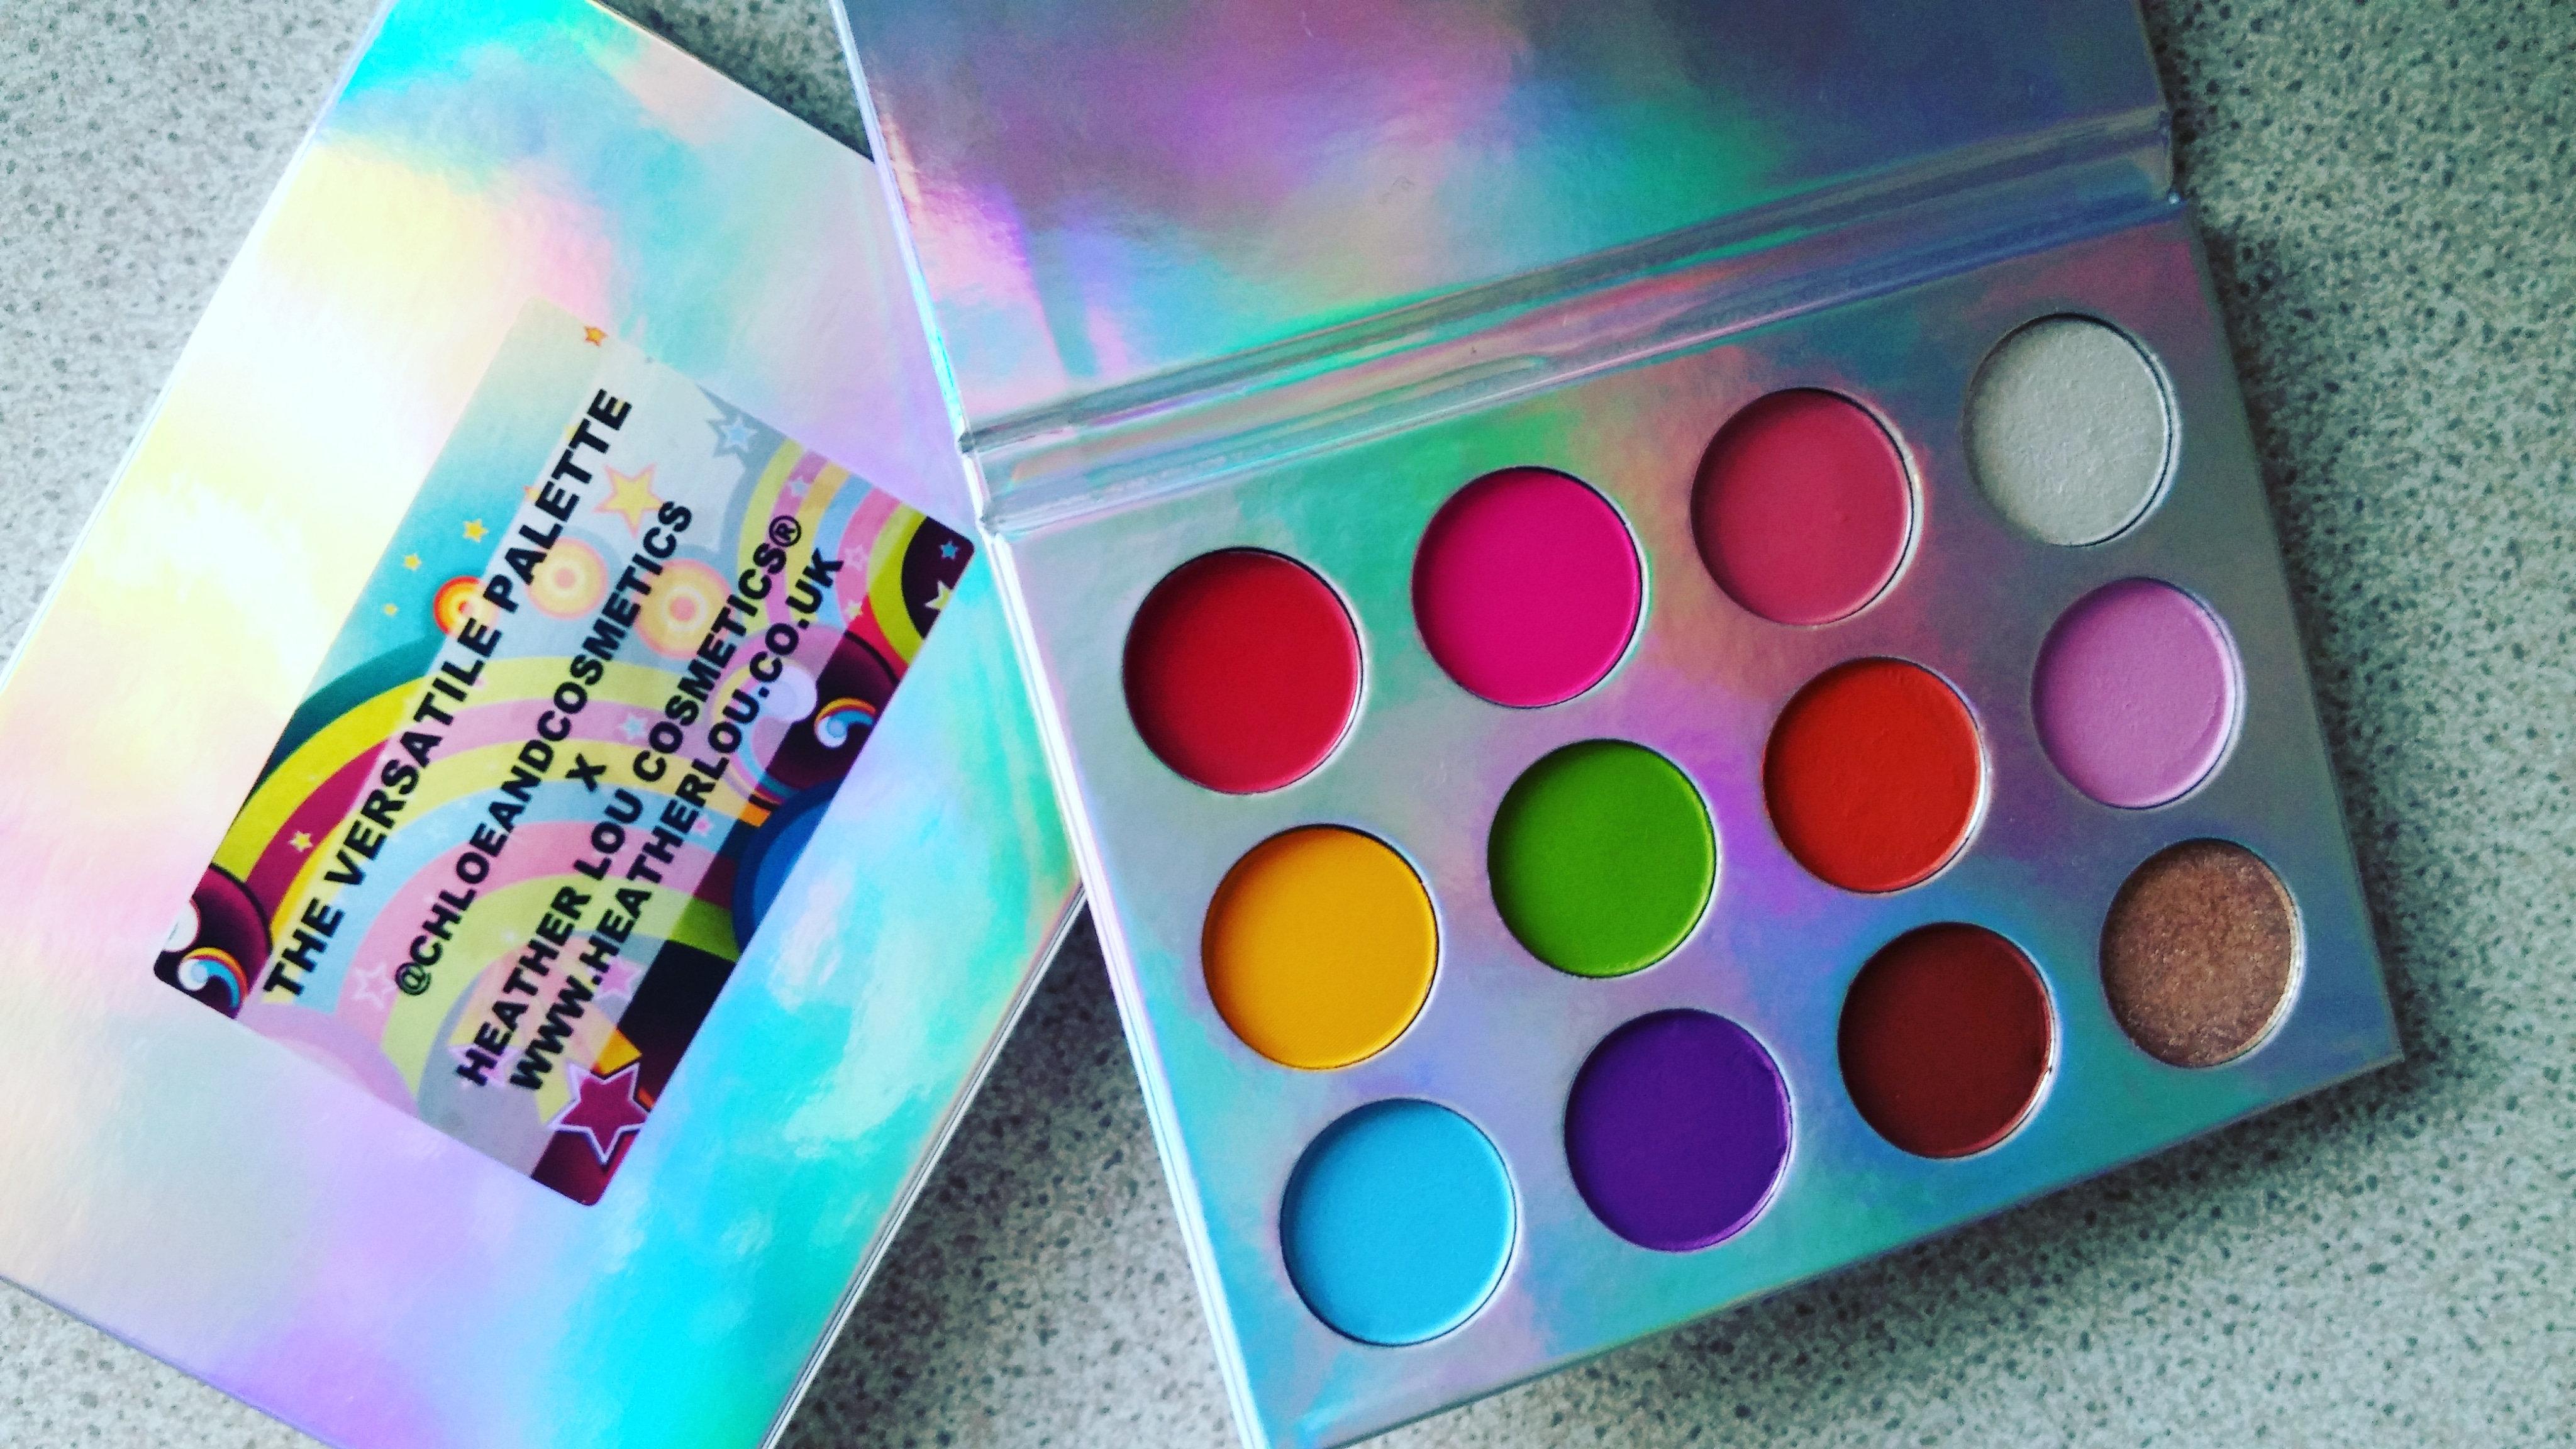 38a7904e3275 Heather Lou Cosmetics 12 Colour The Versatile Palette Matte   Shimmer  Eyeshadow